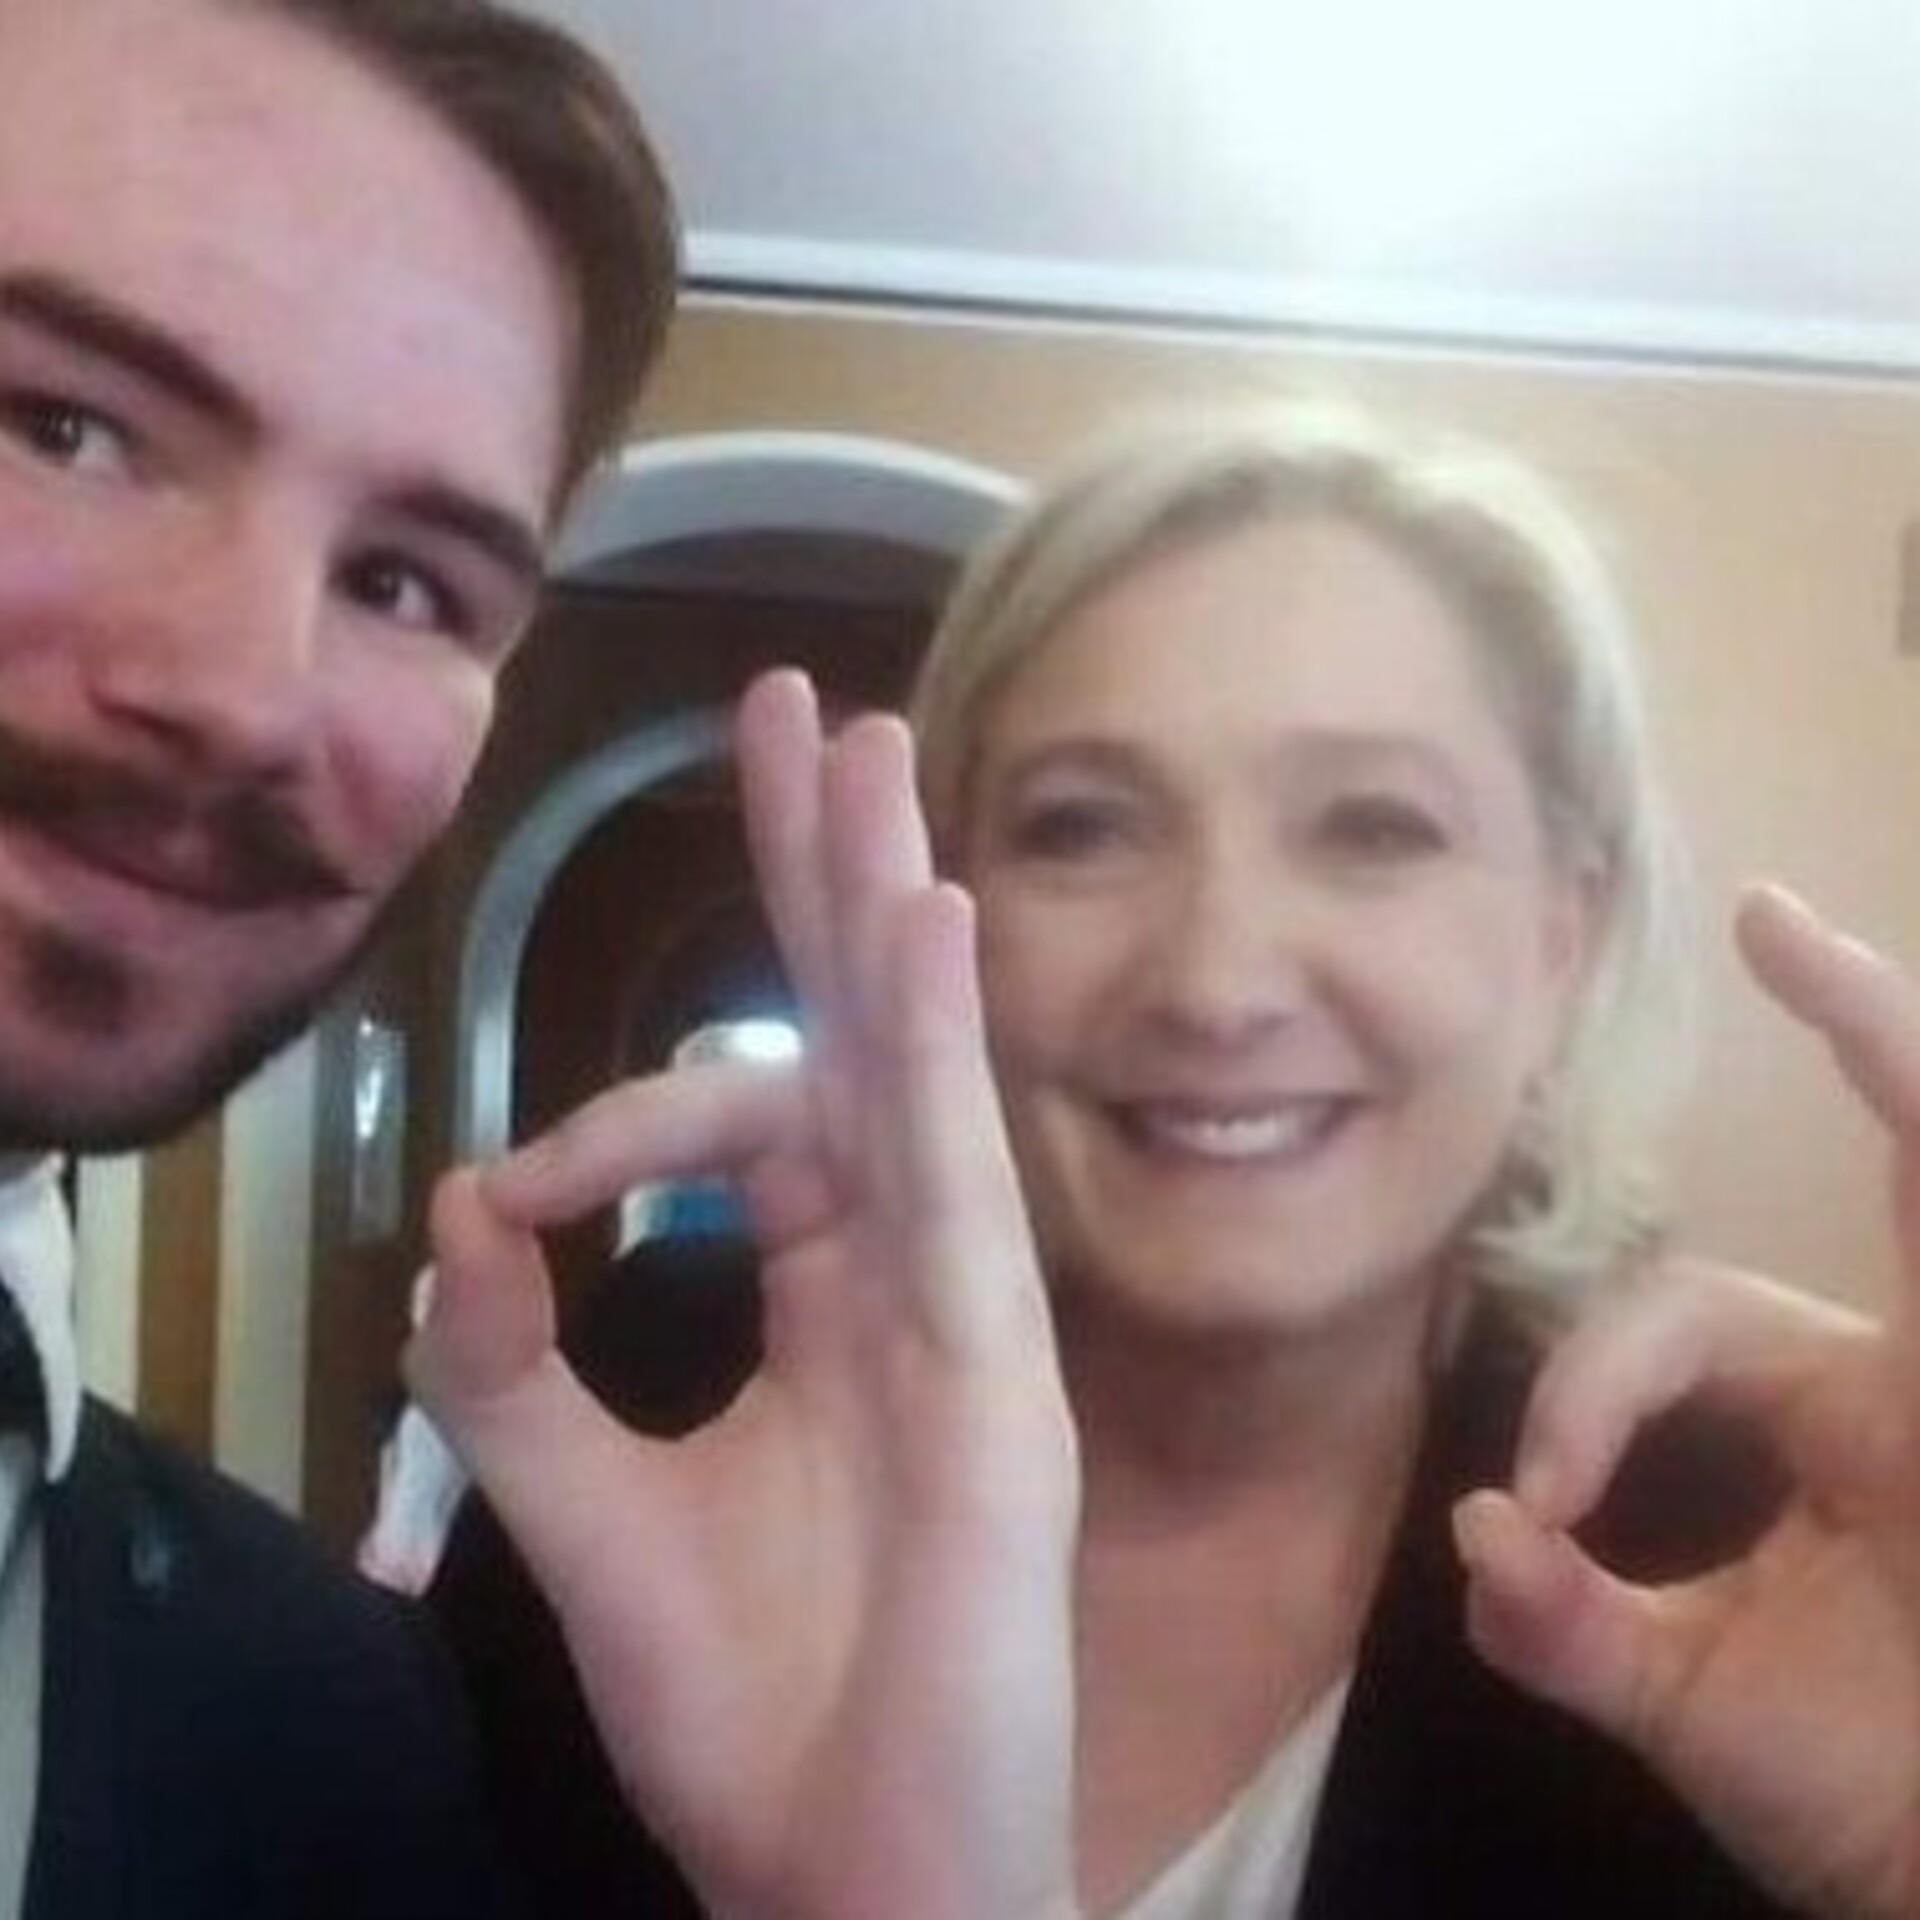 Marine Le Pen Asks Ekre Mp To Delete Selfie From Social Media Page